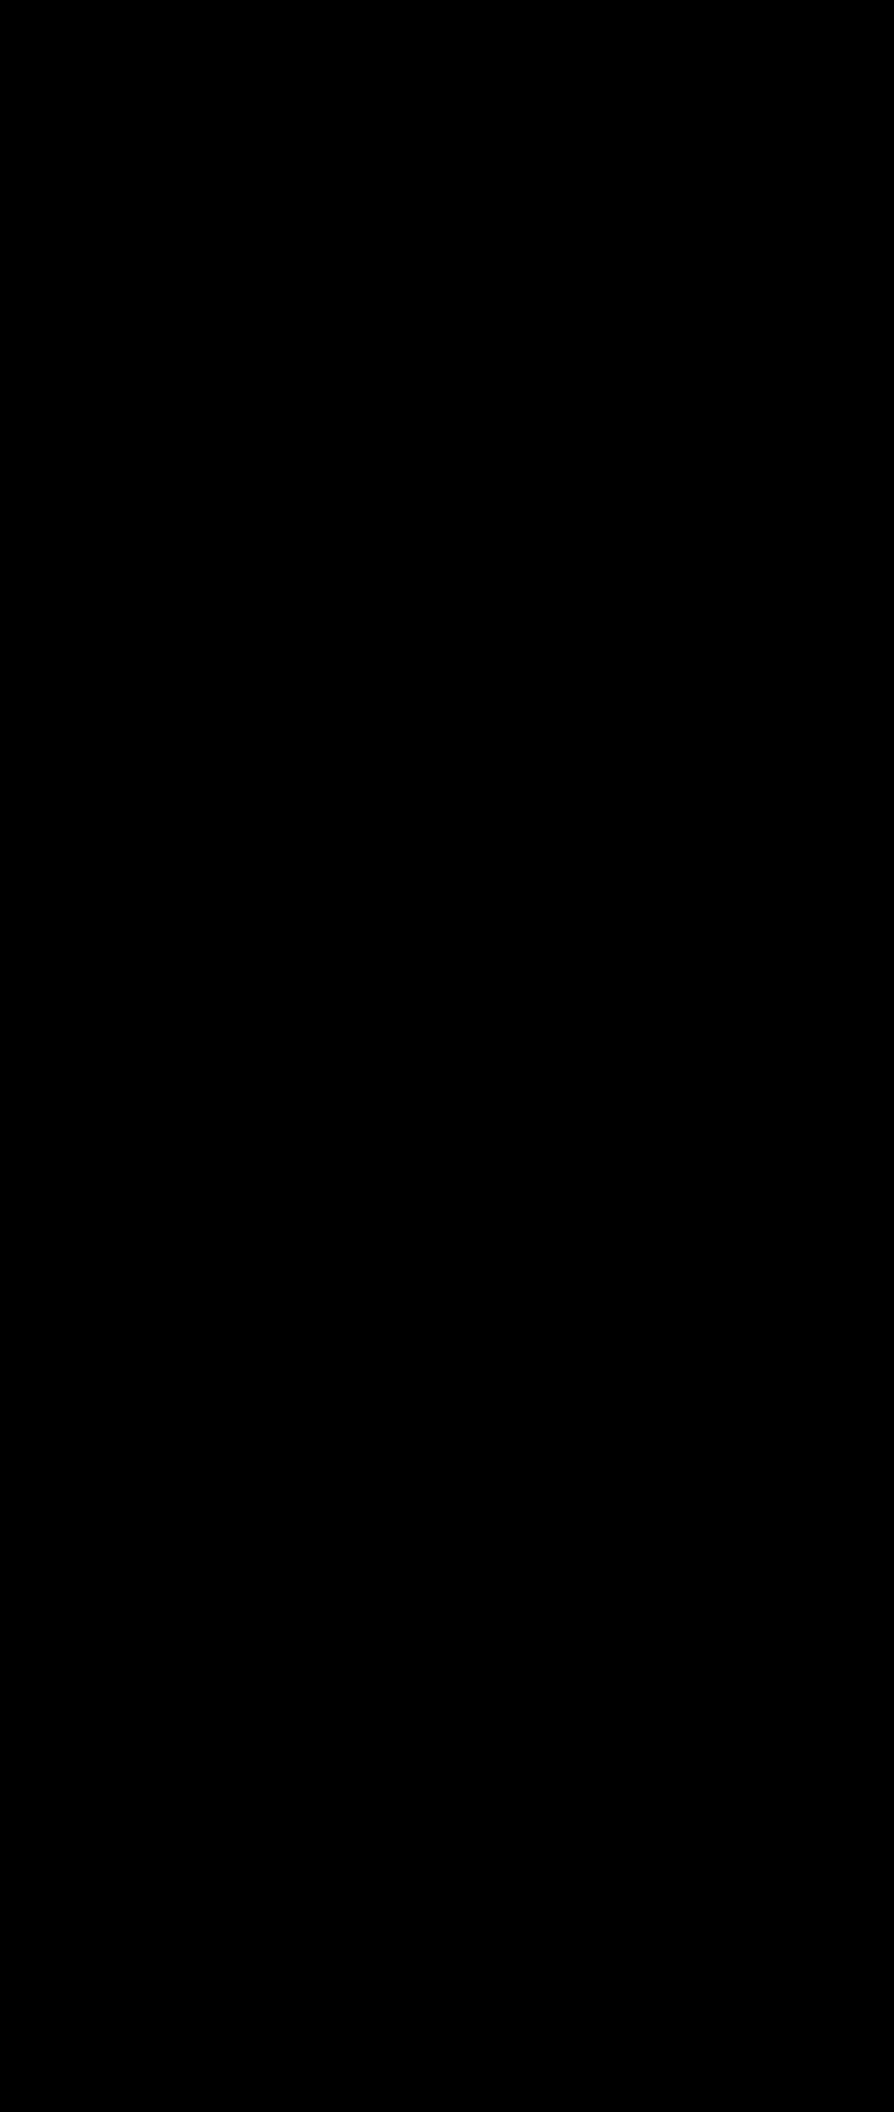 Sleleton clipart silhouette Clipart Skeleton Woman Woman Half